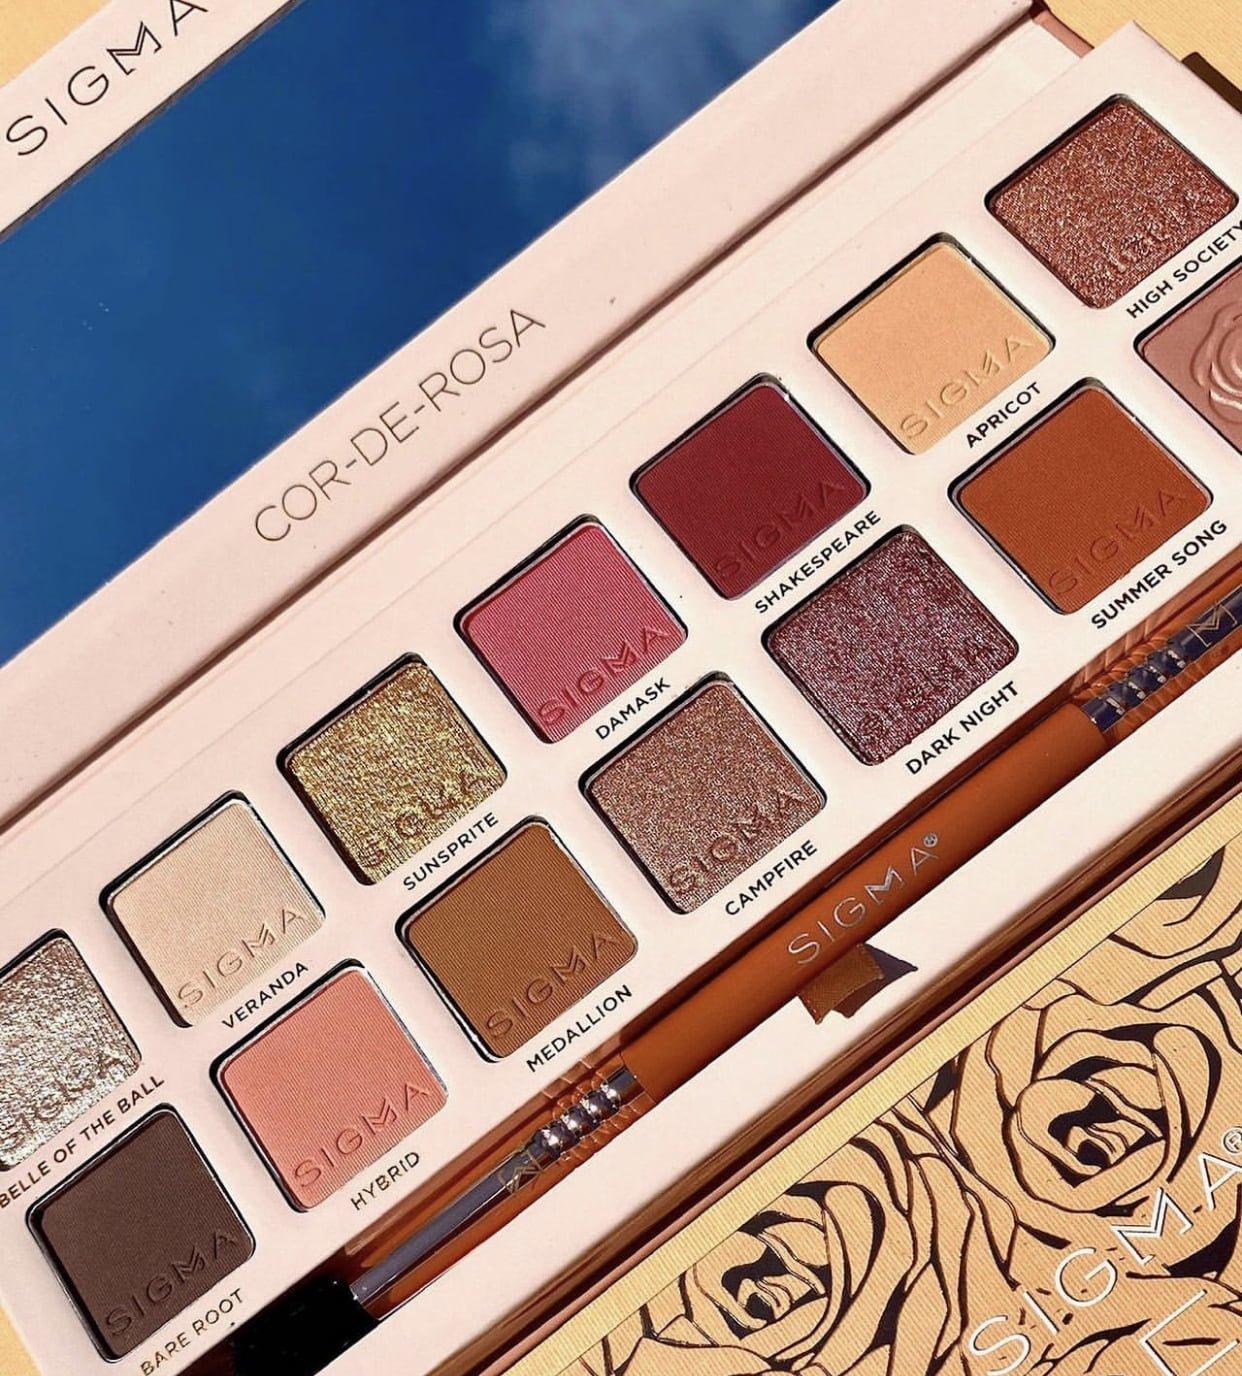 Sigma Cor de Rosa Eyeshadow Palette